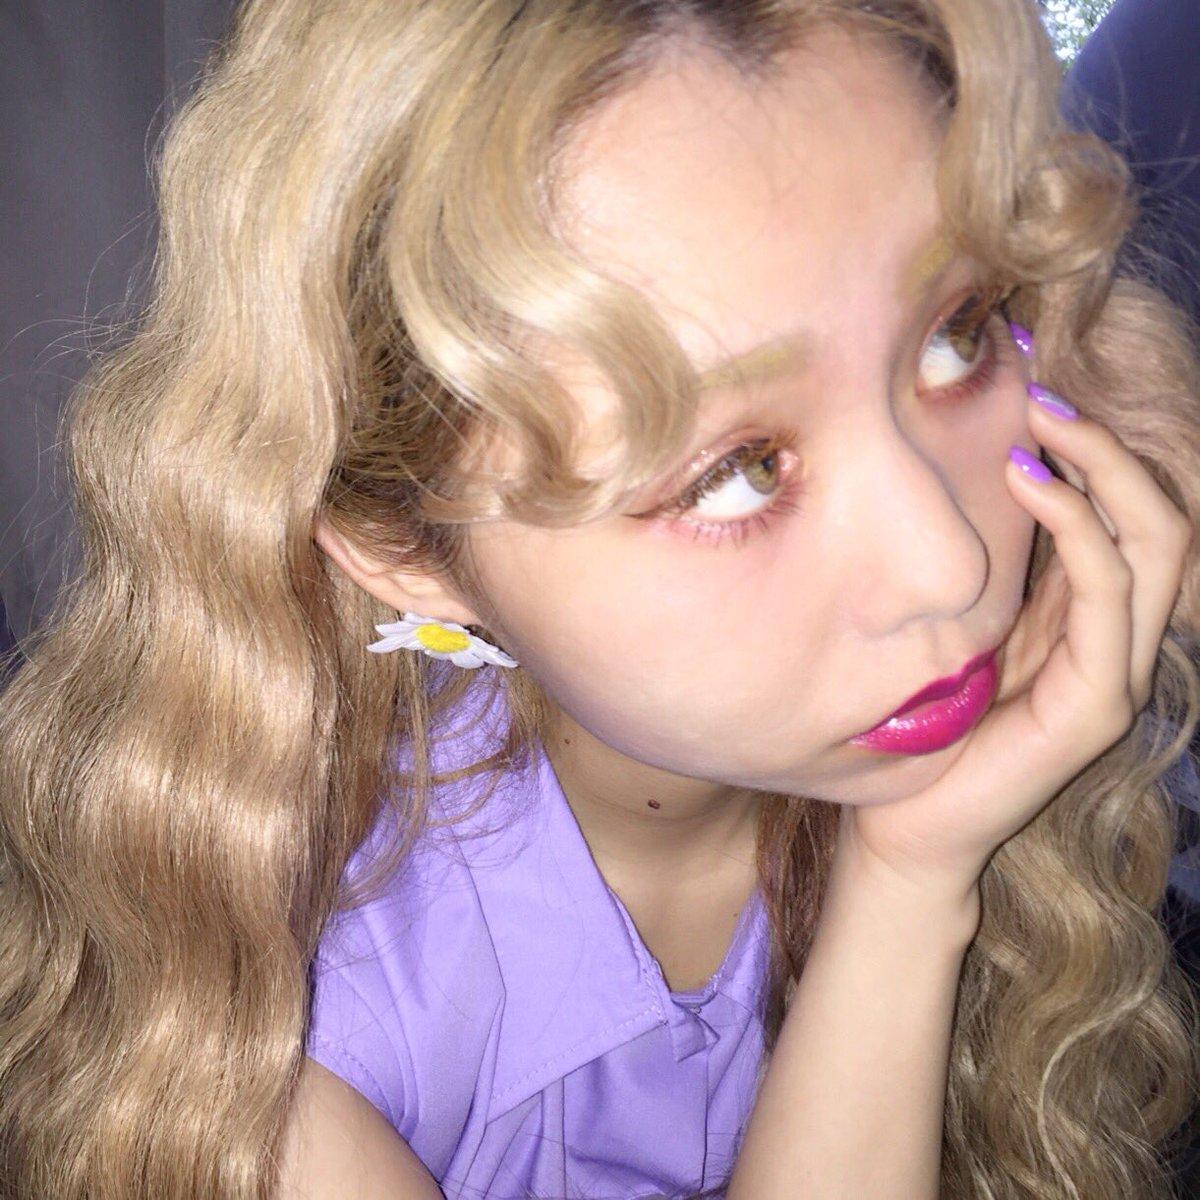 #PECOCLUB のお花のピアス🌼かわいい〜お気に入り…💜